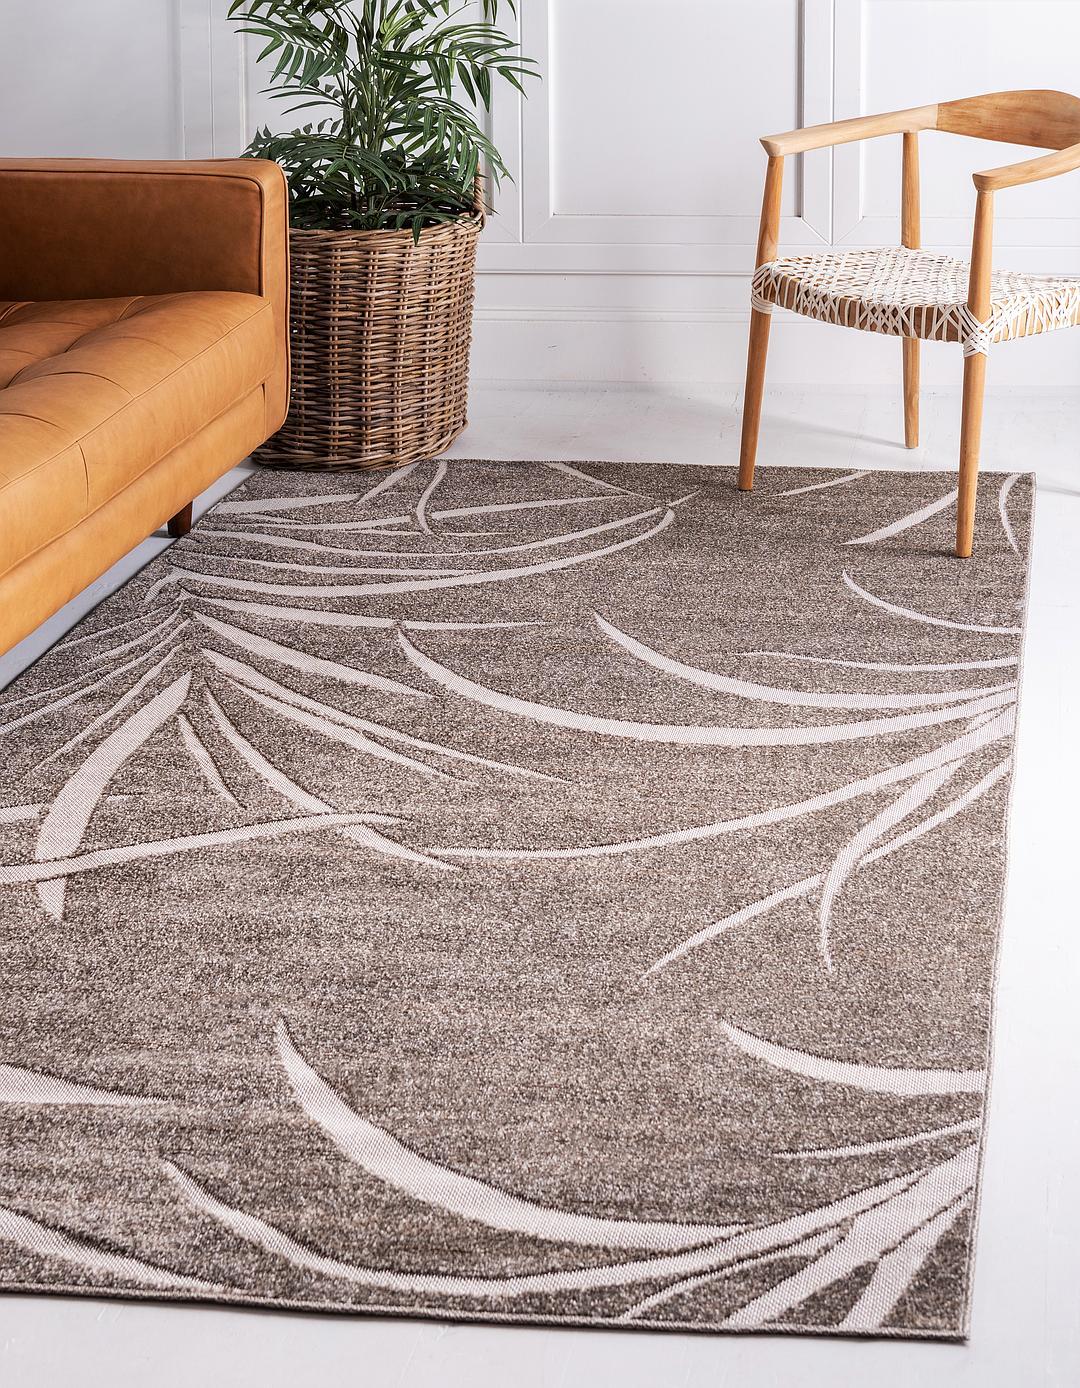 brown 6 39 x 9 39 outdoor botanical rug area rugs. Black Bedroom Furniture Sets. Home Design Ideas